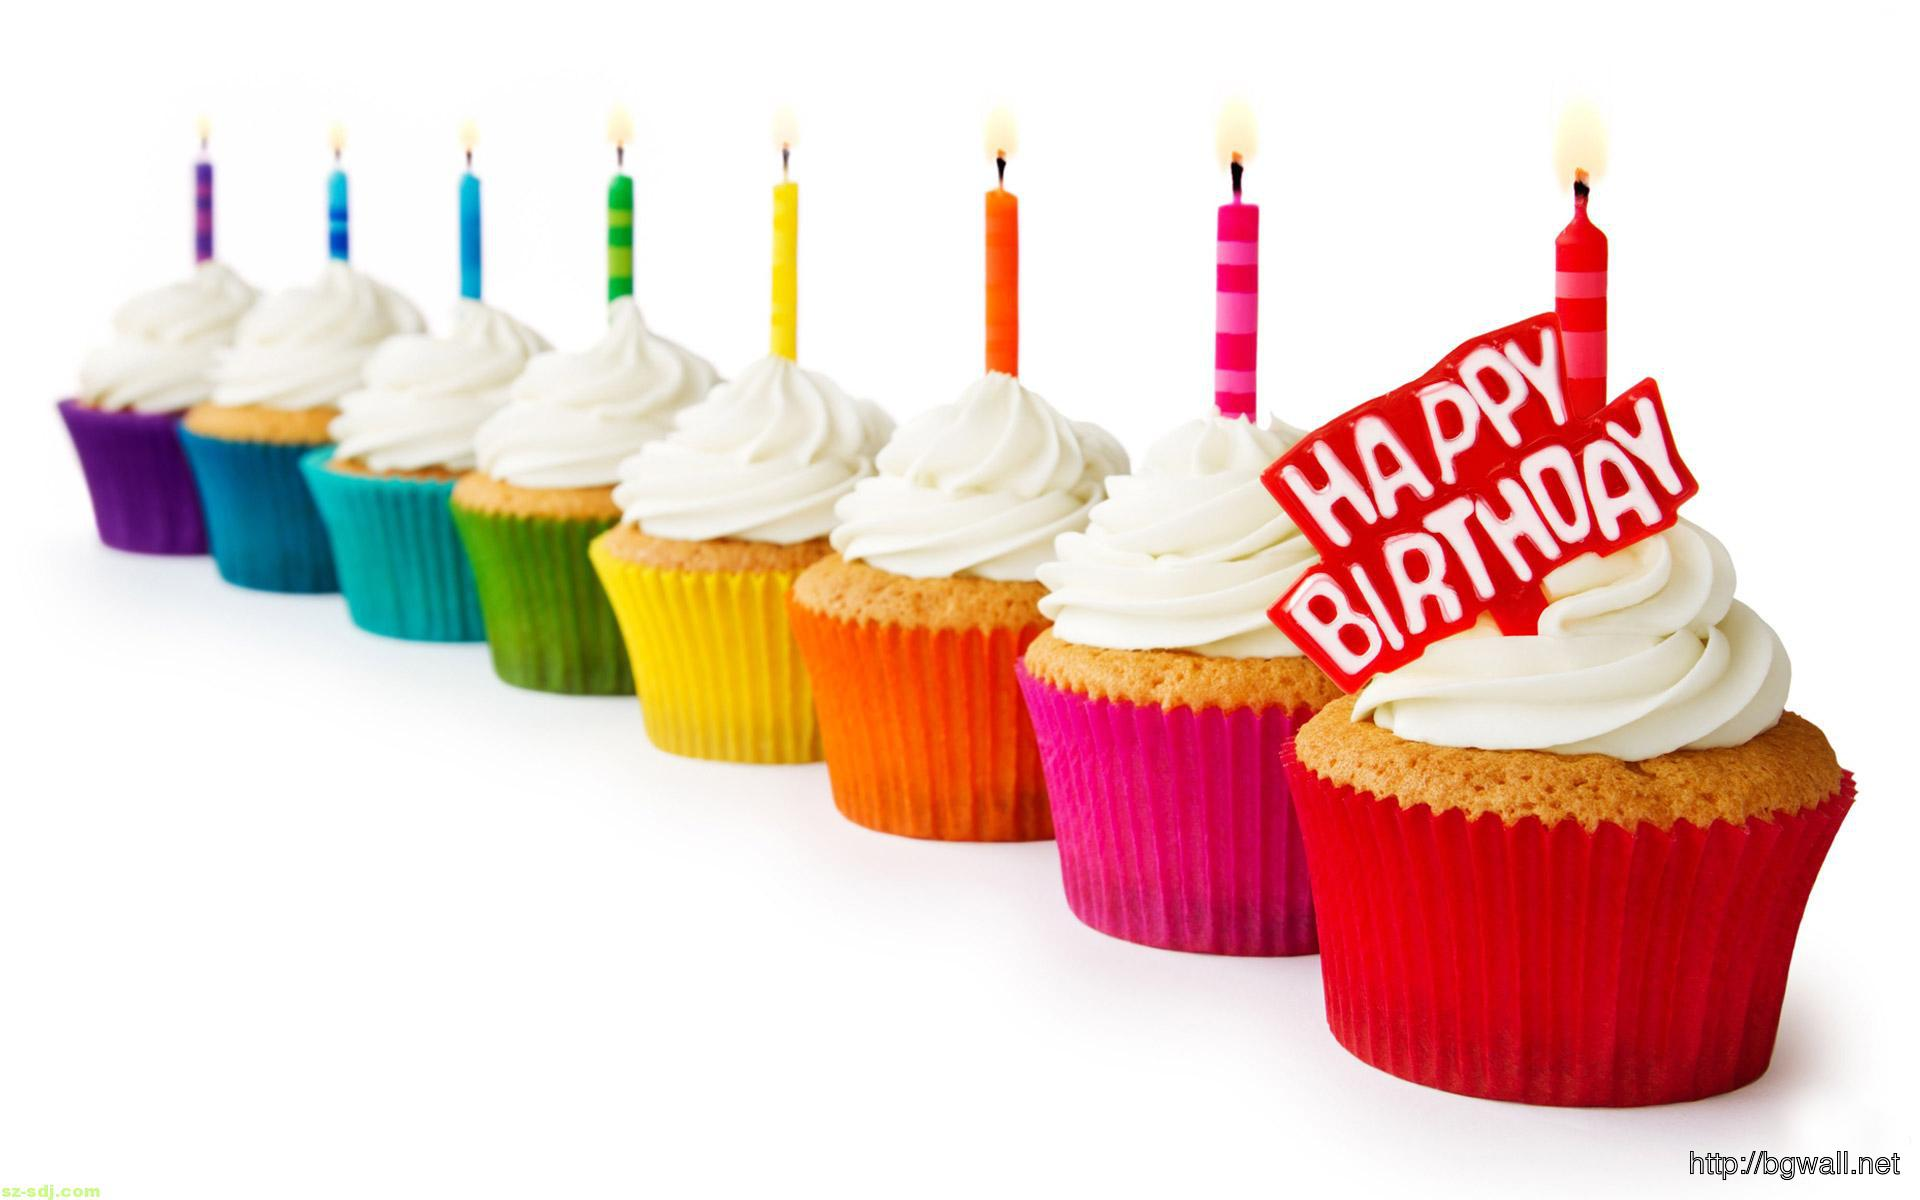 Happy Birthday Cake Image Wallpaper Computer1 Background Wallpaper Hd